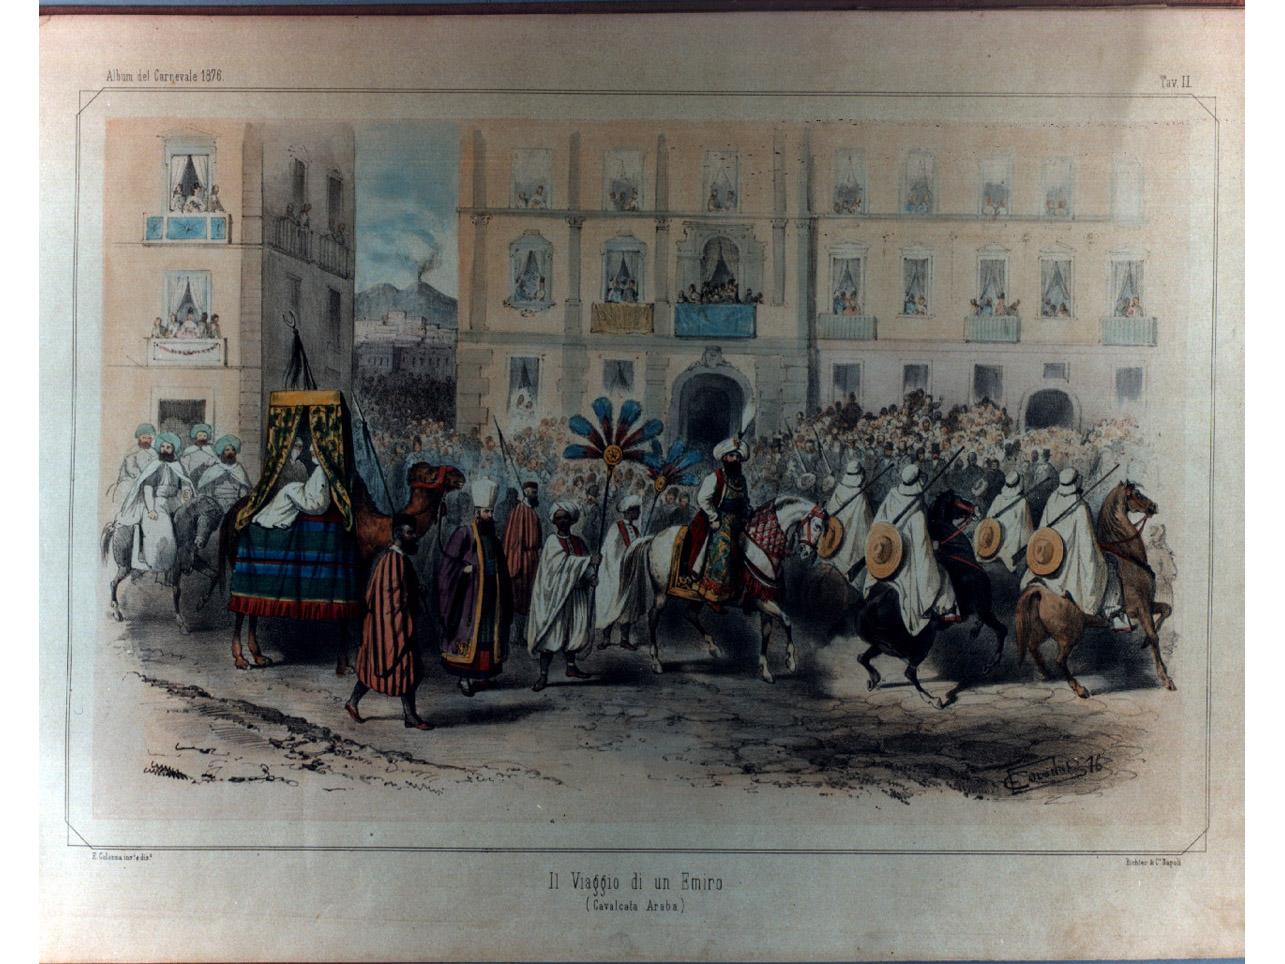 corteo carnevalesco (stampa a colori, elemento d'insieme) di Colonna Enrico, Richter Ludwig (sec. XIX)